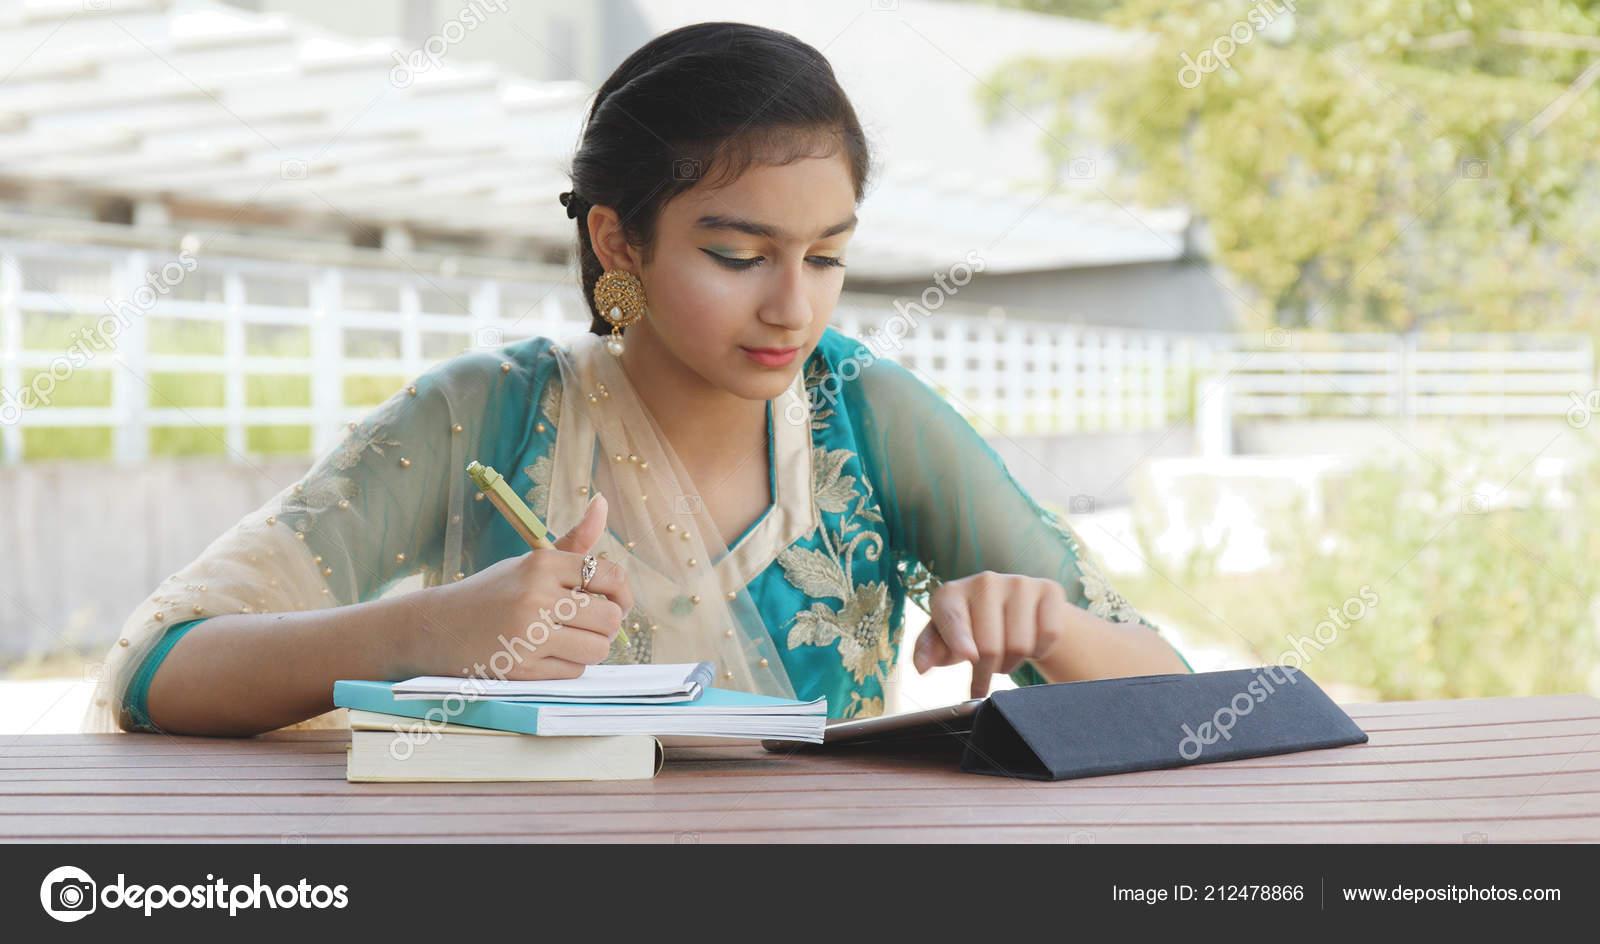 Consider, Very young pakistani girls